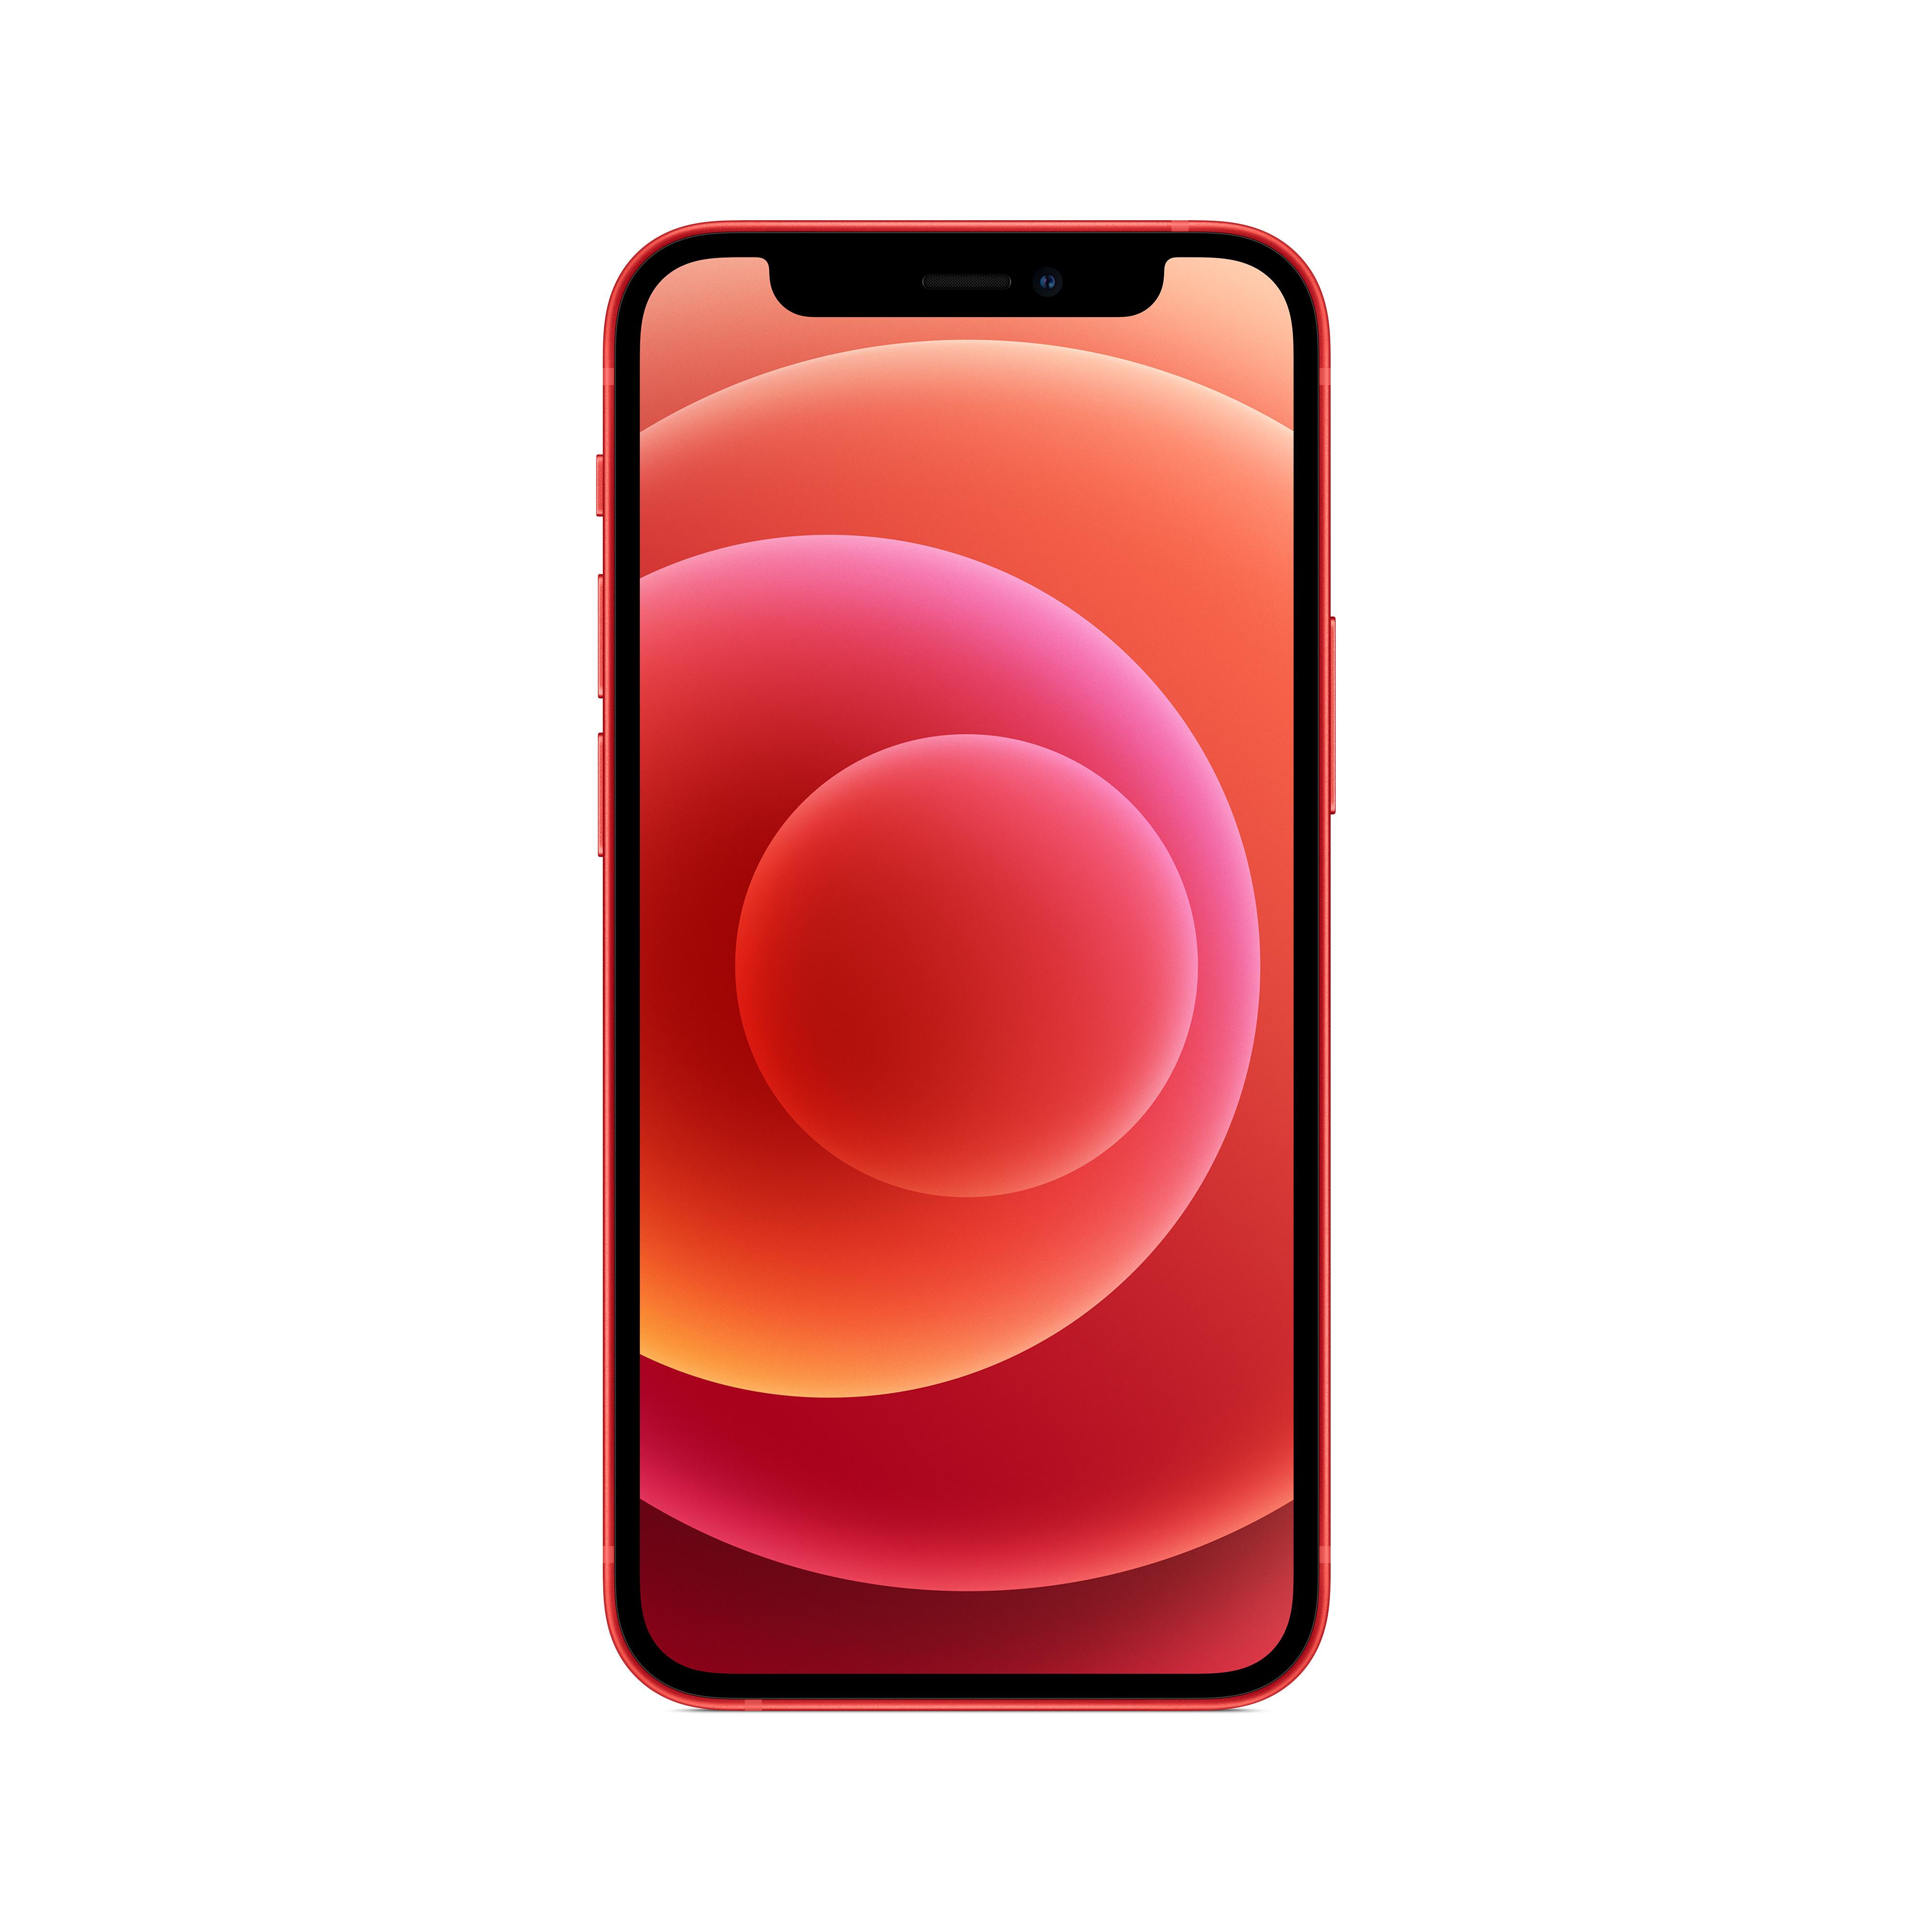 Apple - iPhone 12 Mini 256gb (product)red